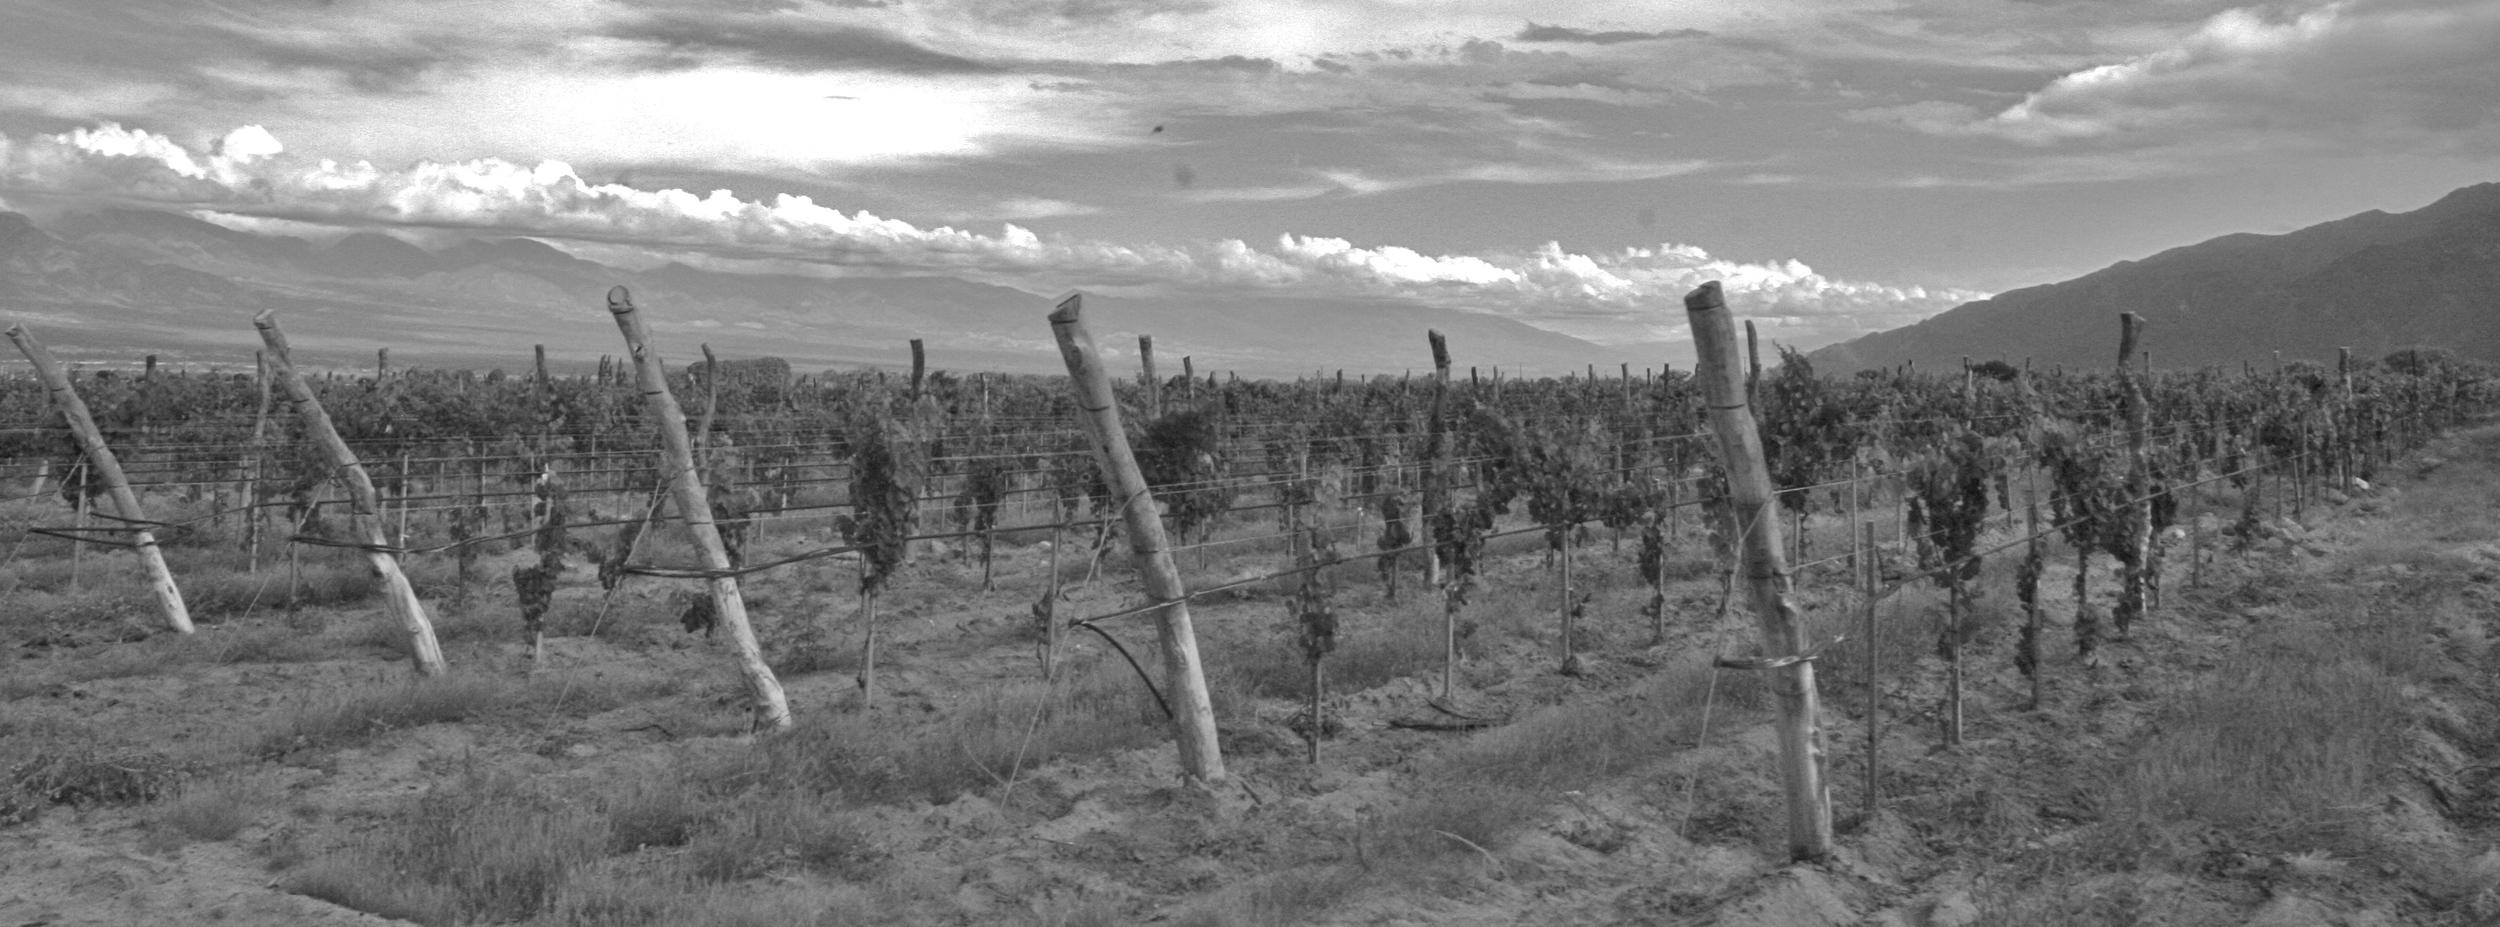 capital wine  469.jpg